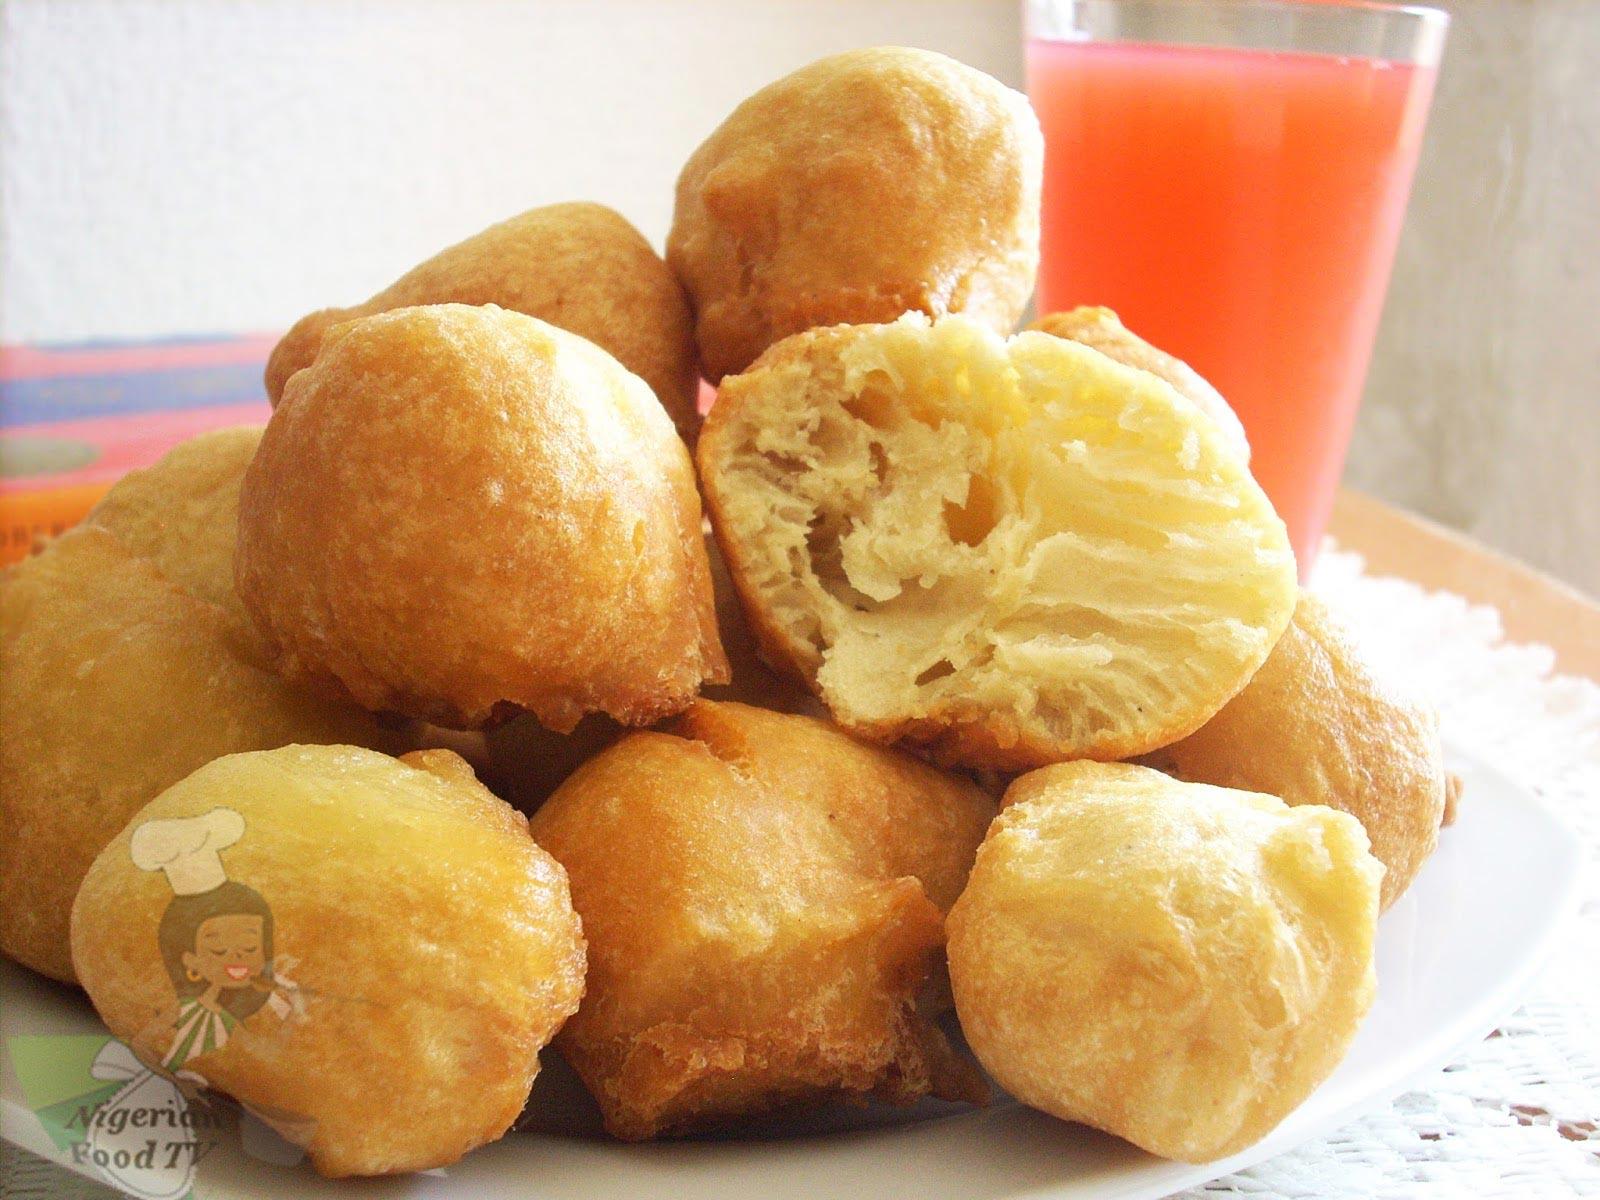 nigerian-buns-2-NigerianFoodTv